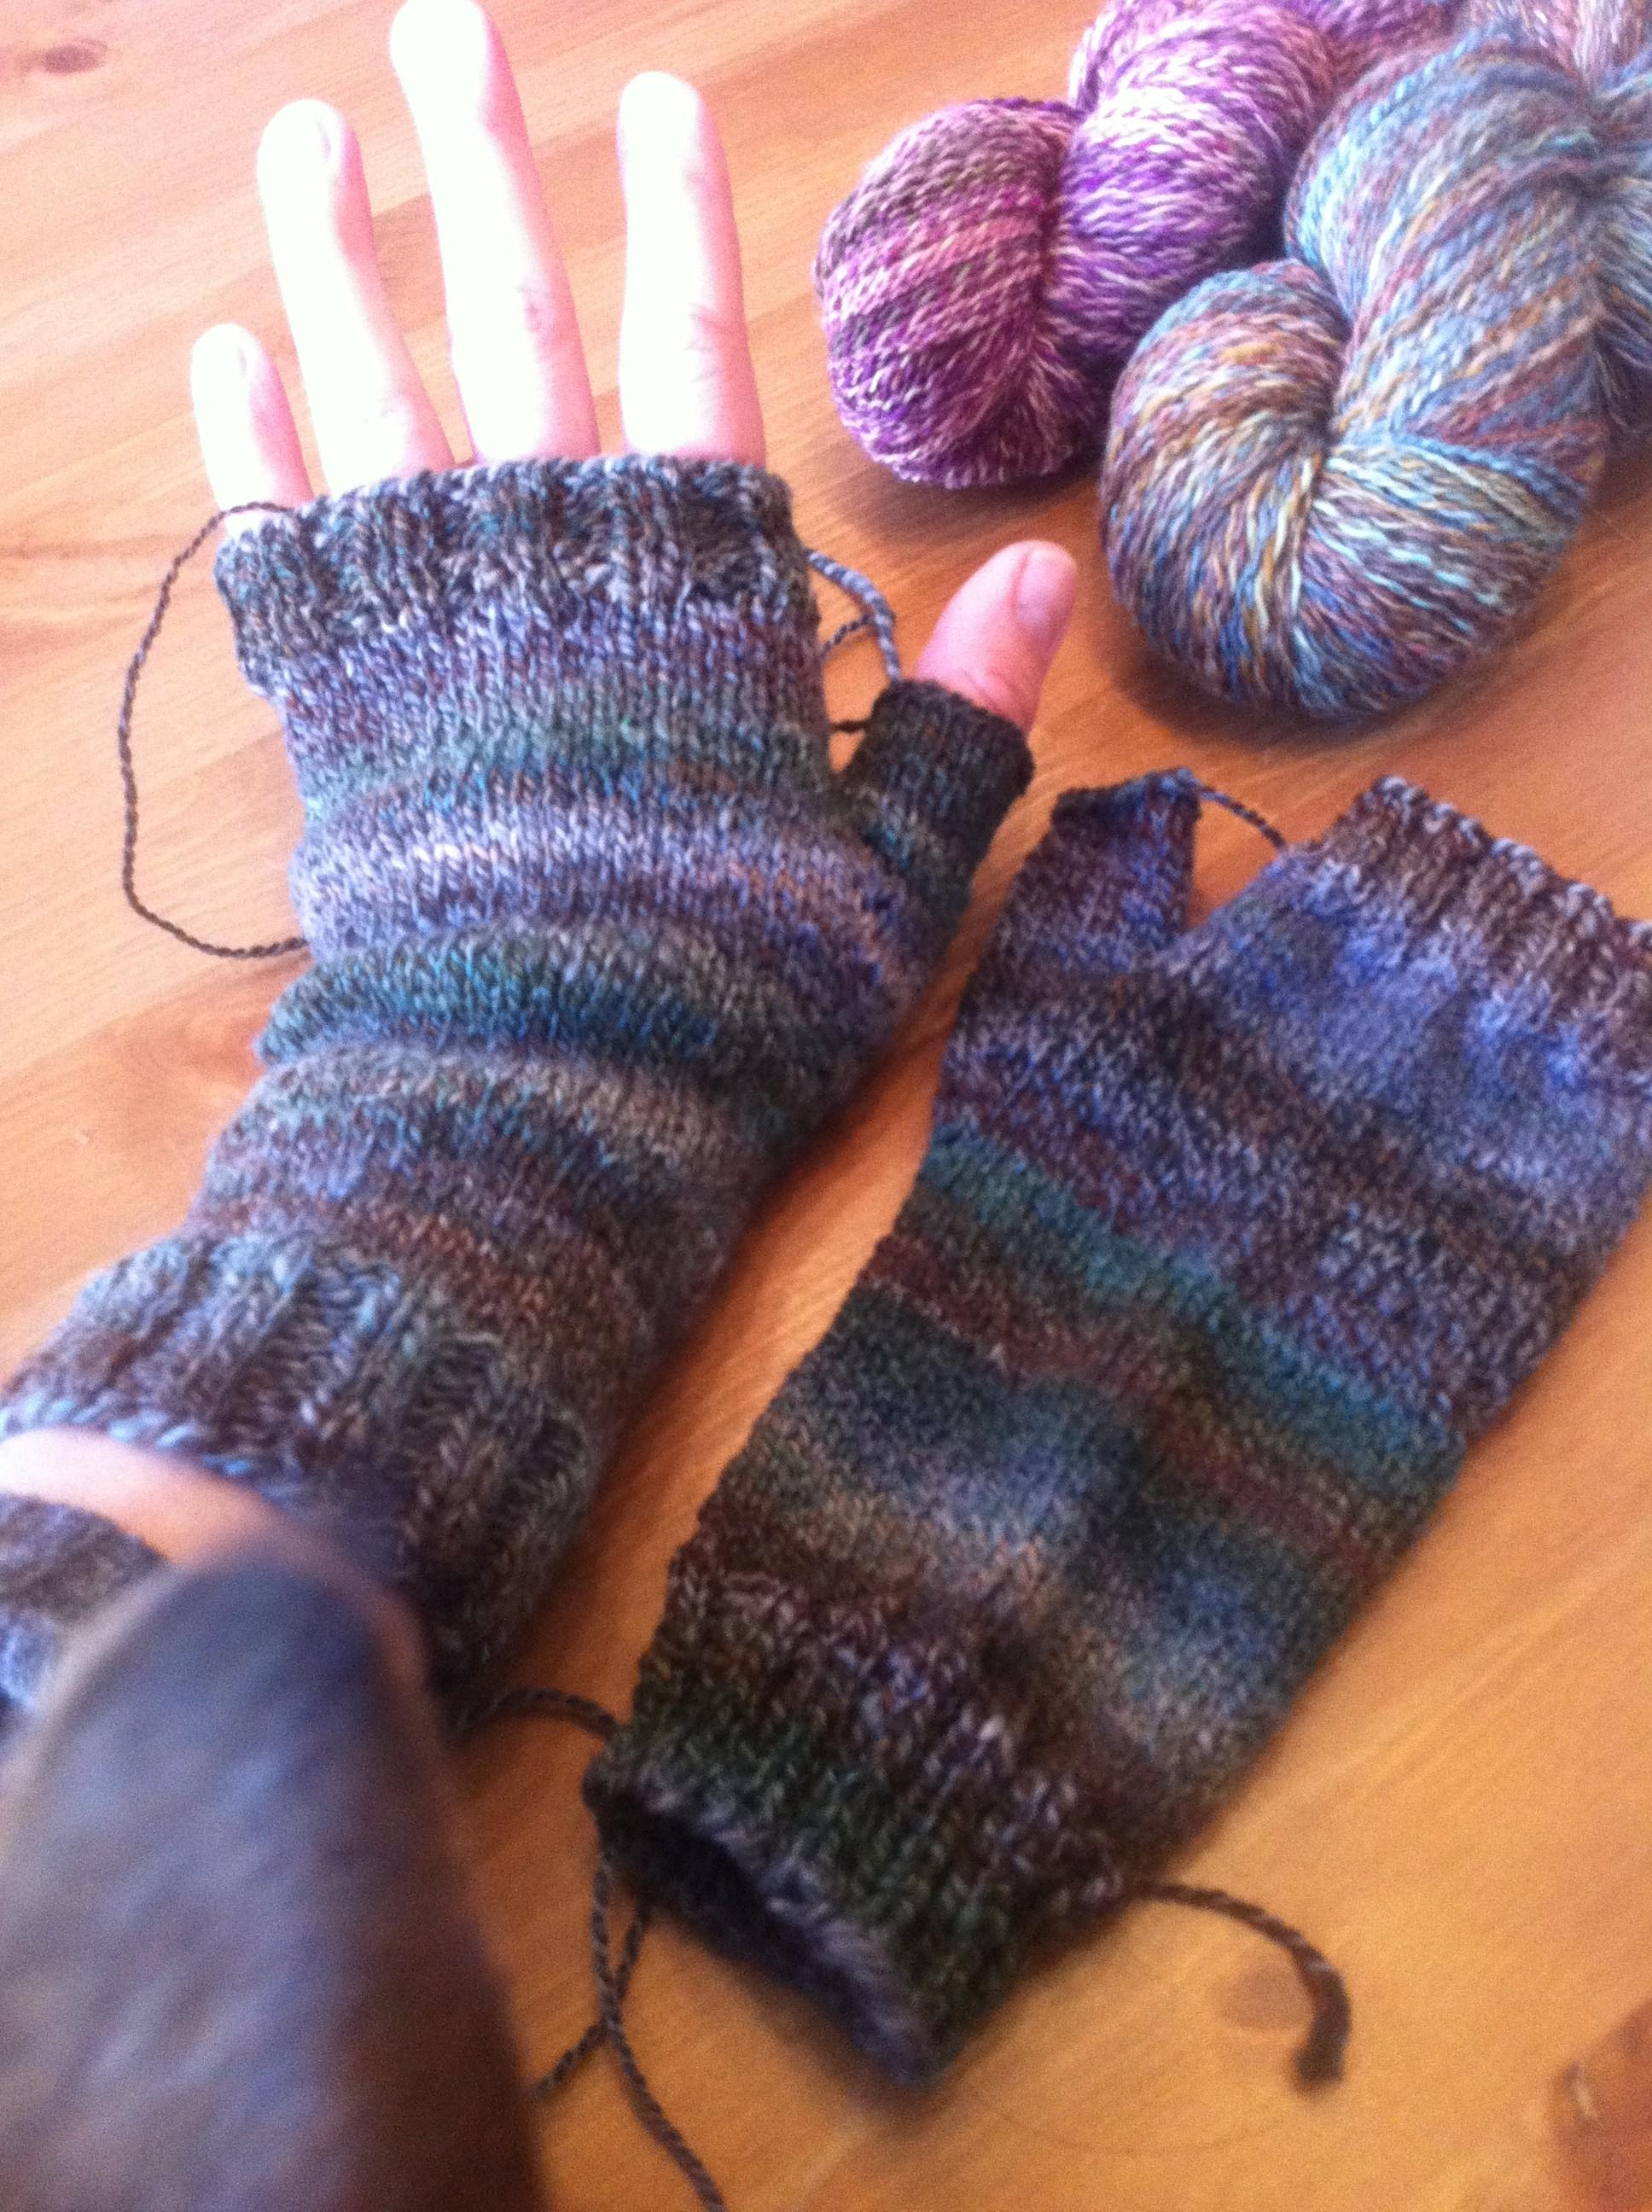 Handspun Armwarmers, Wristwarmers, Handwarmers…Whatever you call them!